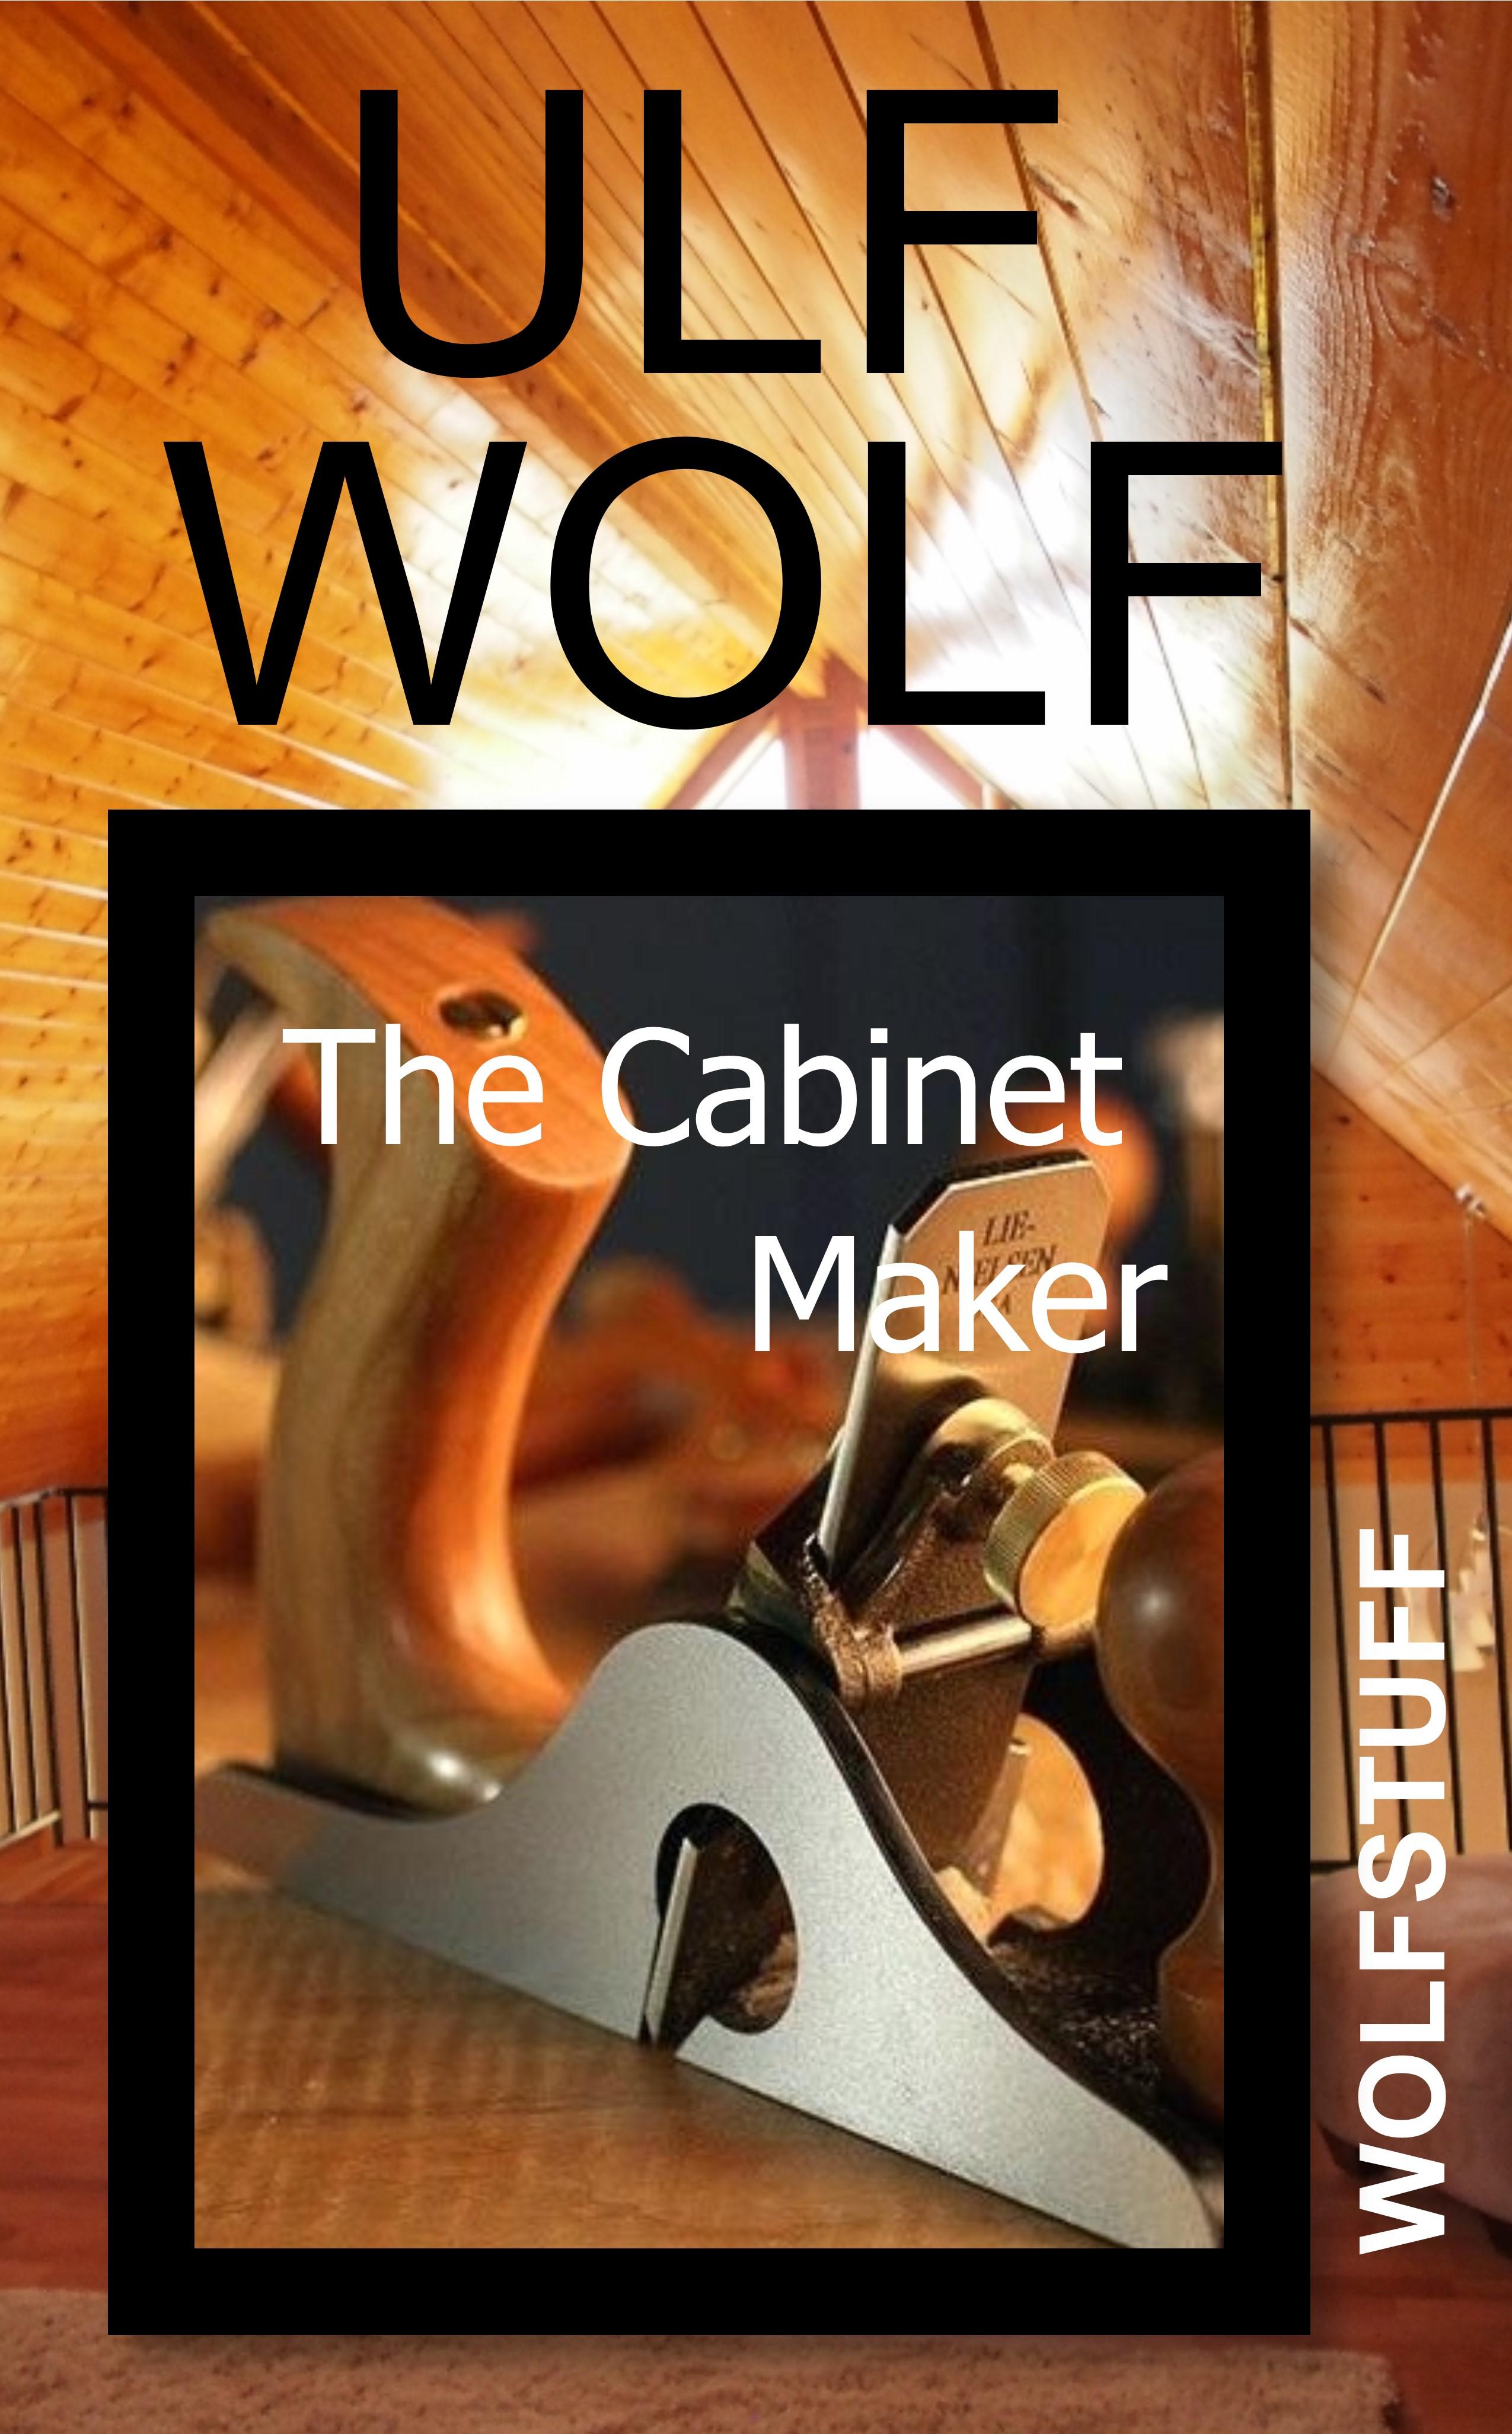 Awe Inspiring The Cabinet Maker An Ebook By Ulf Wolf Download Free Architecture Designs Pendunizatbritishbridgeorg